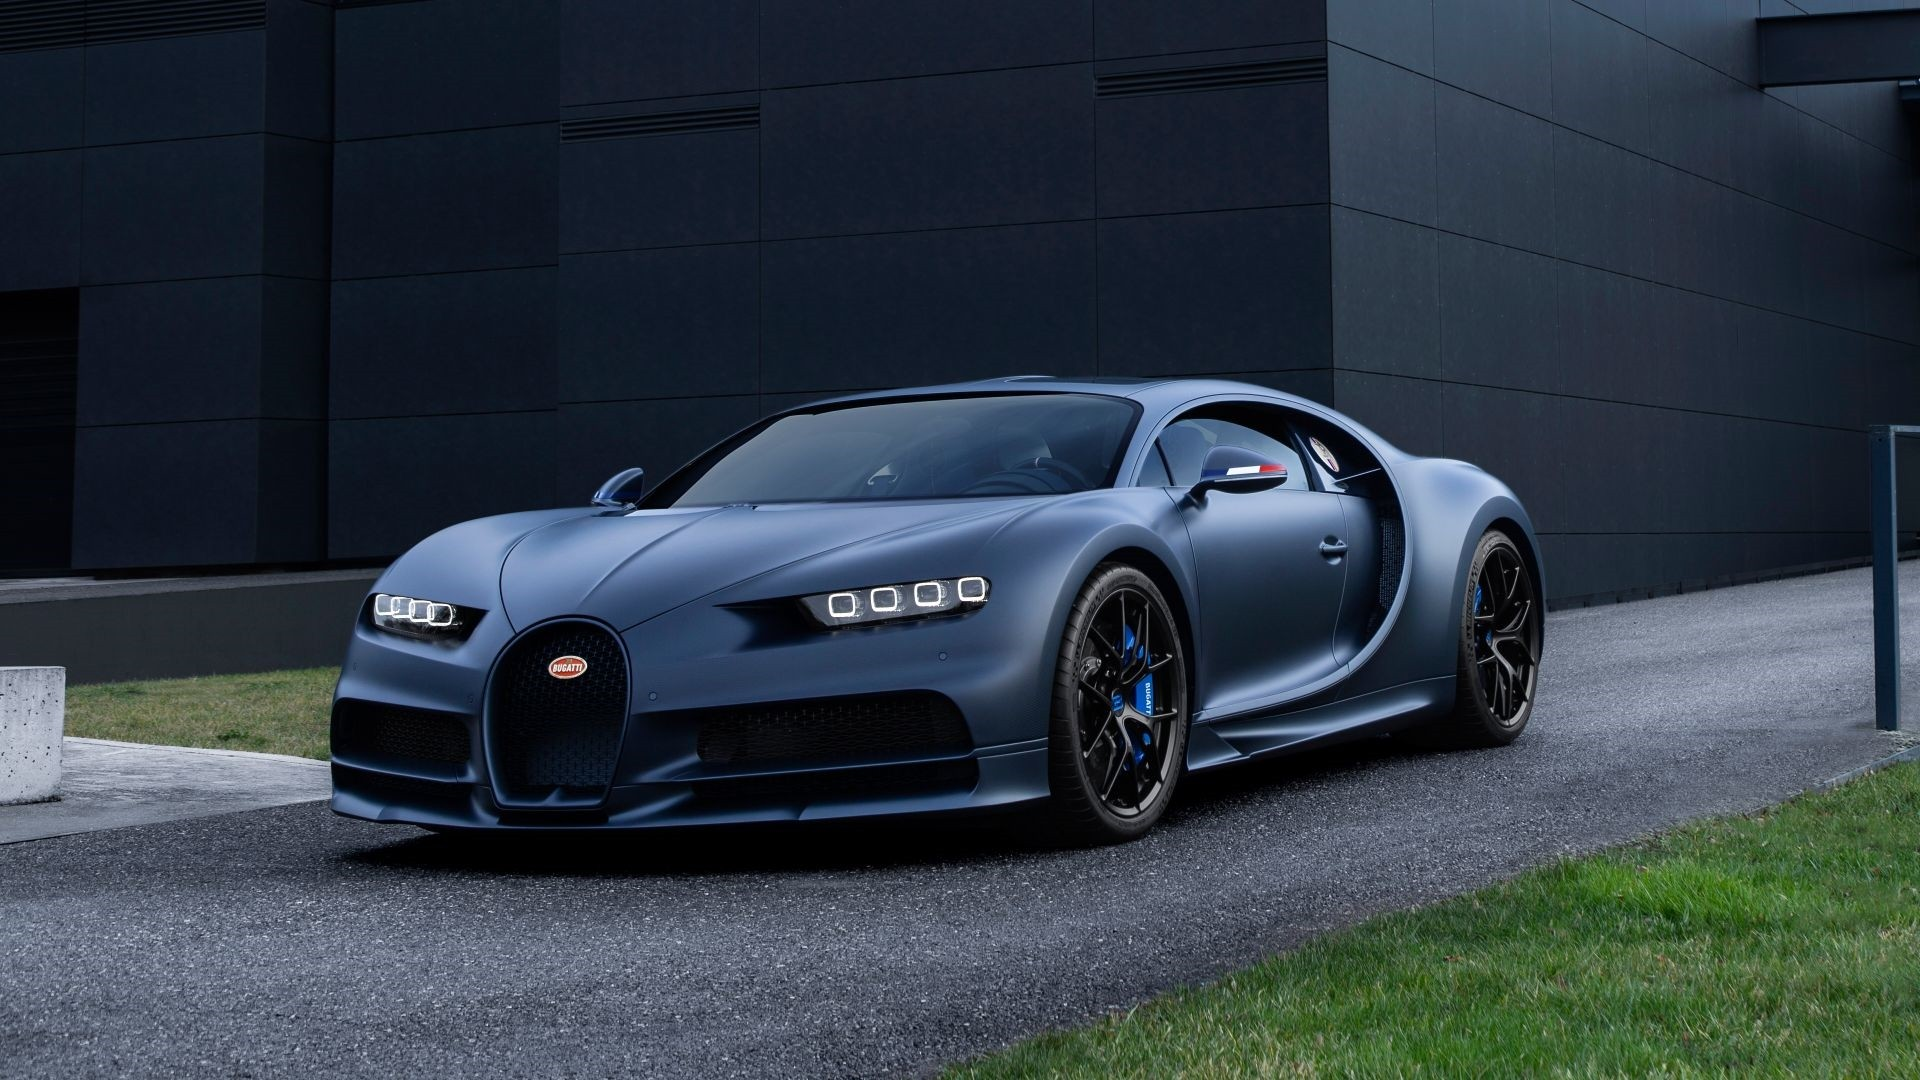 Bugatti Chiron wallpaper photo